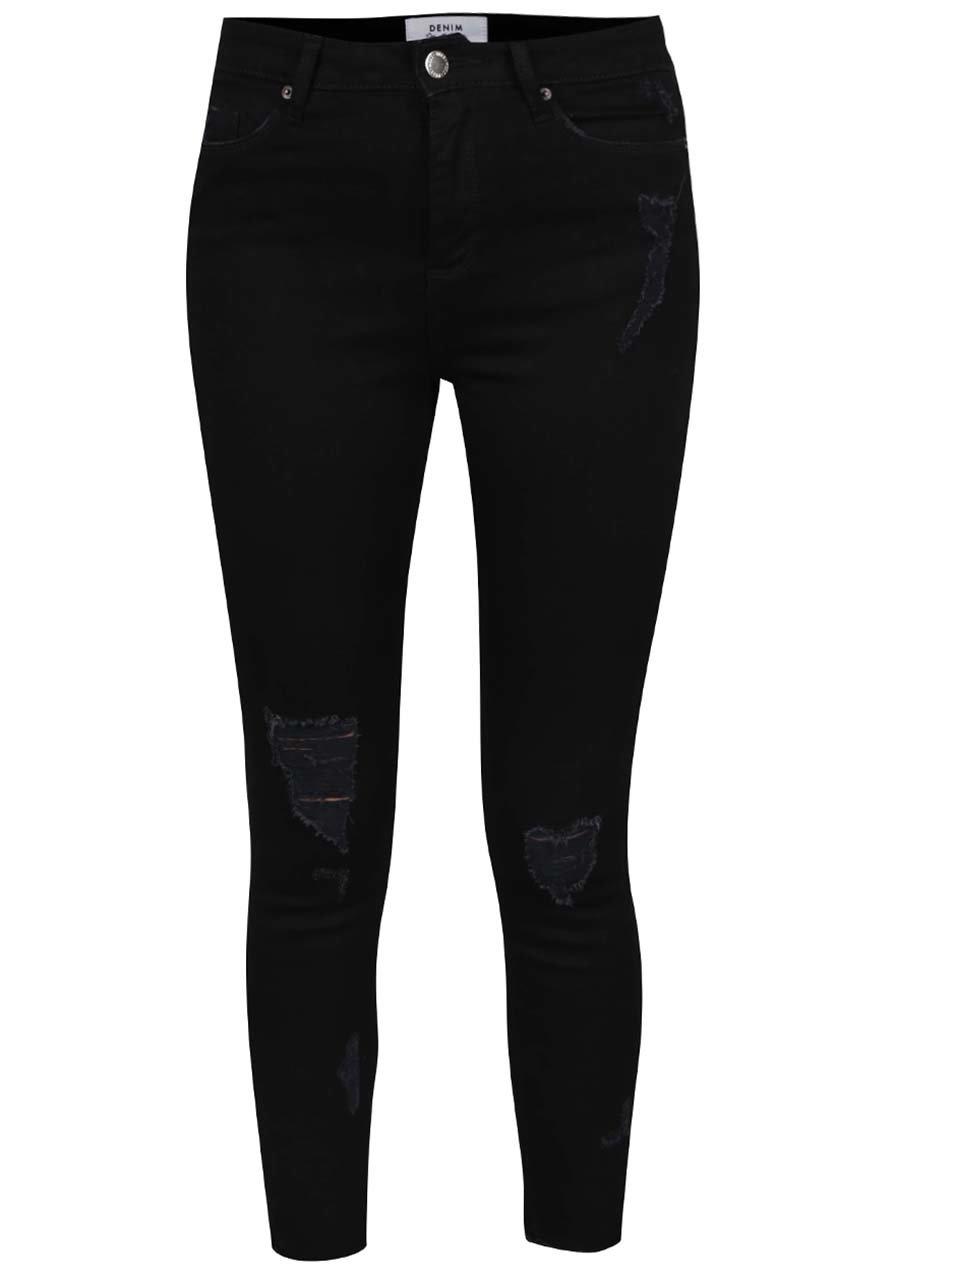 Černé strečové džíny s potrhaným efektem Miss Selfridge